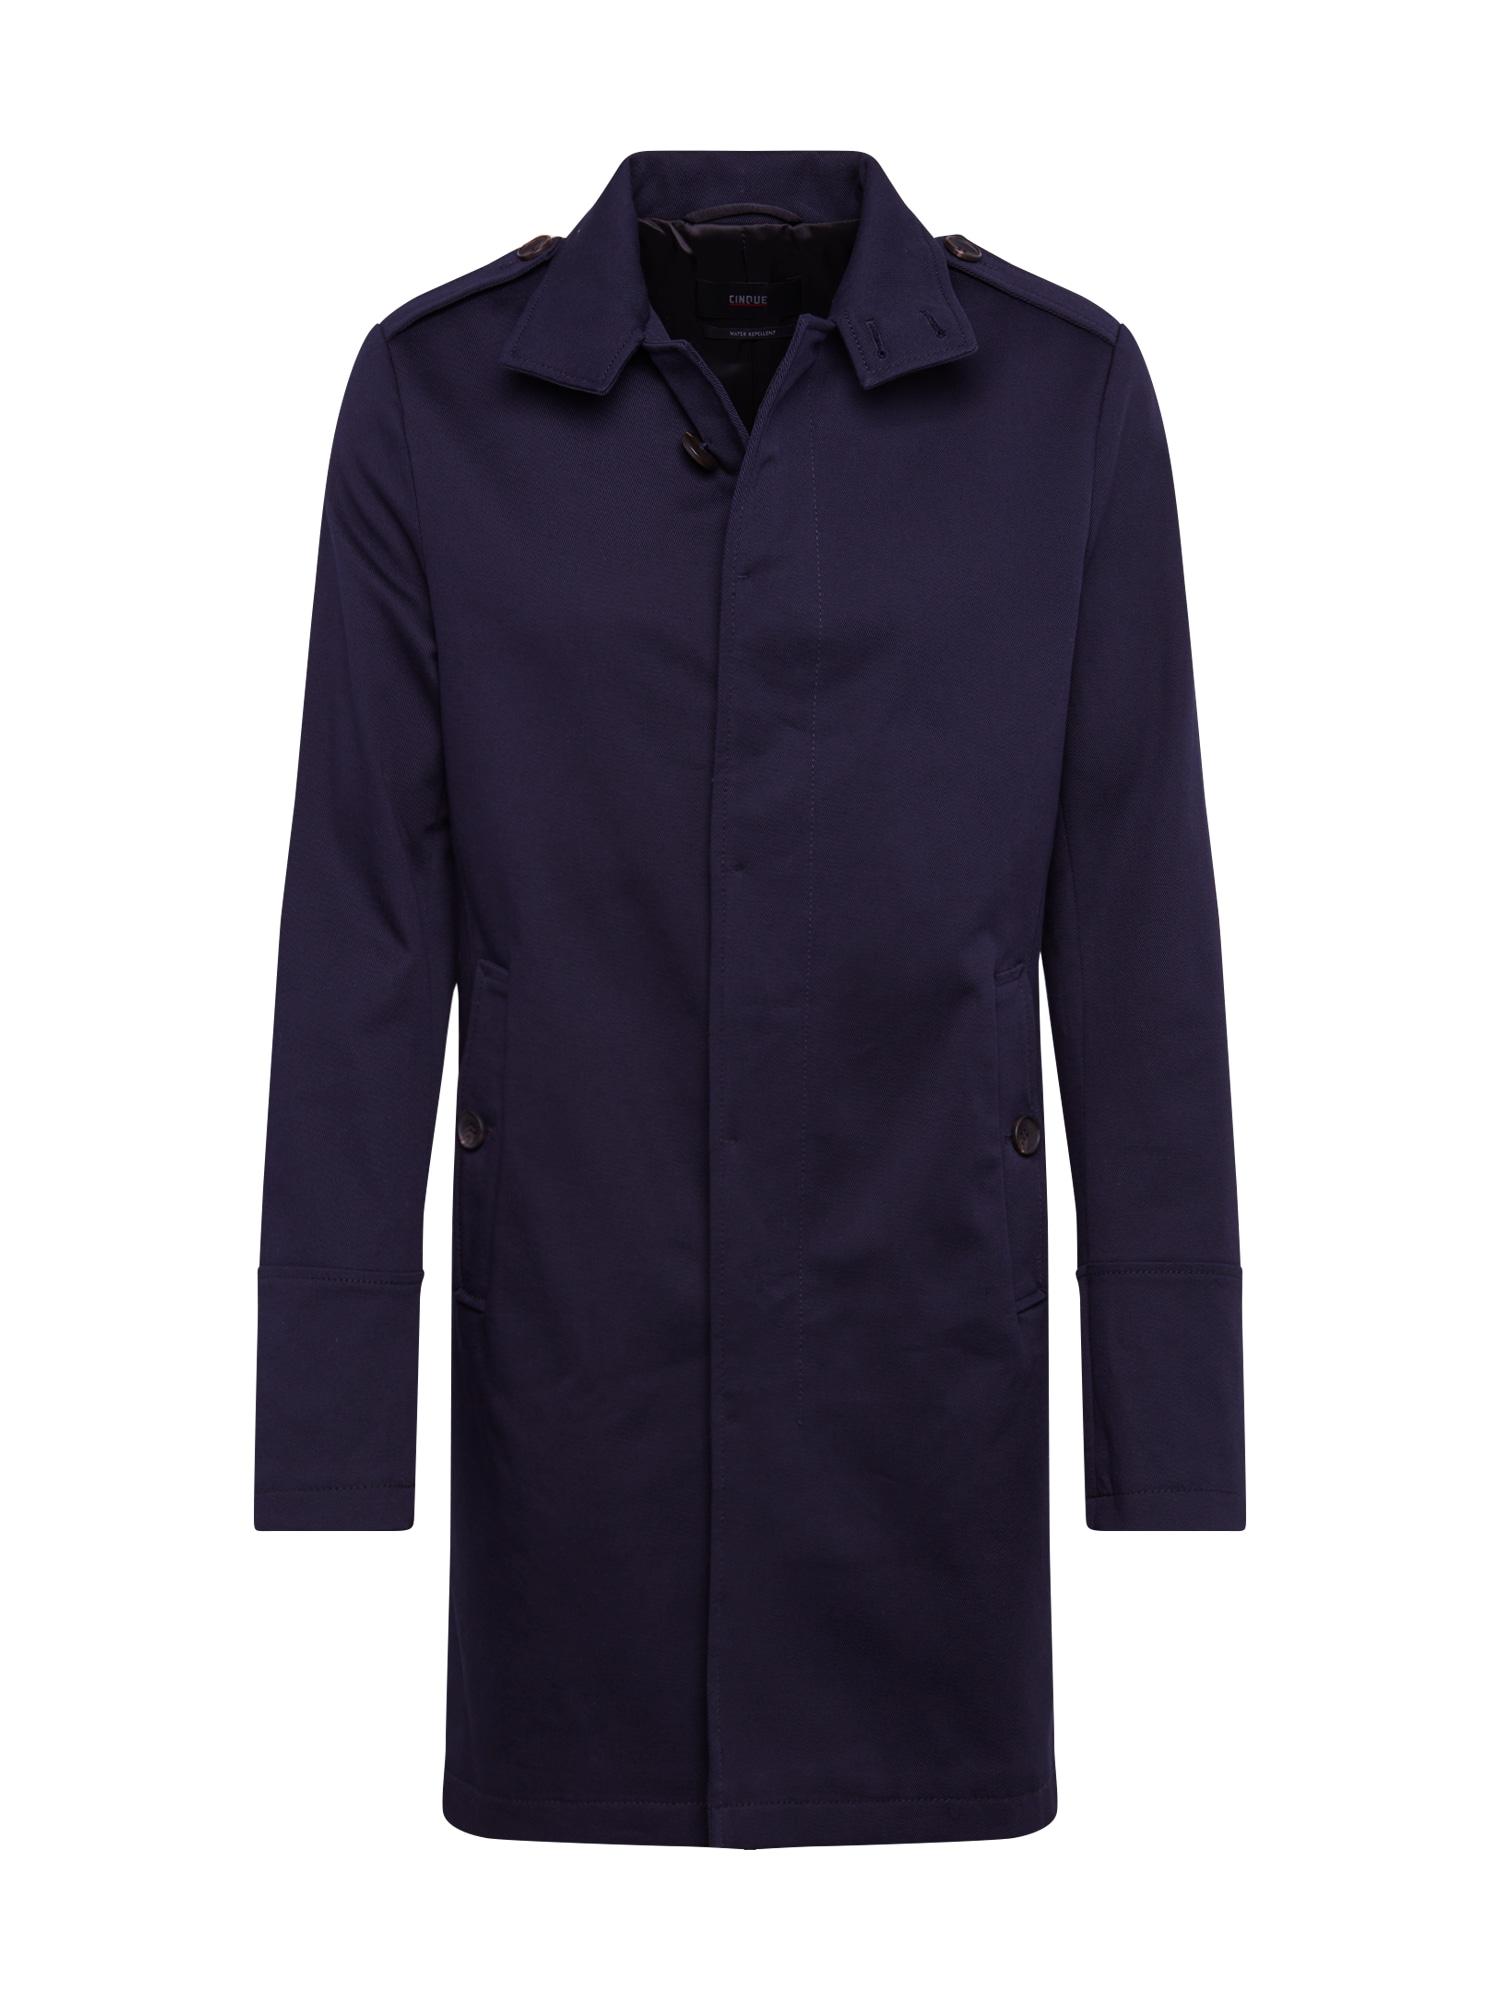 CINQUE Rudeninis-žieminis paltas 'CISTERLING' mėlyna